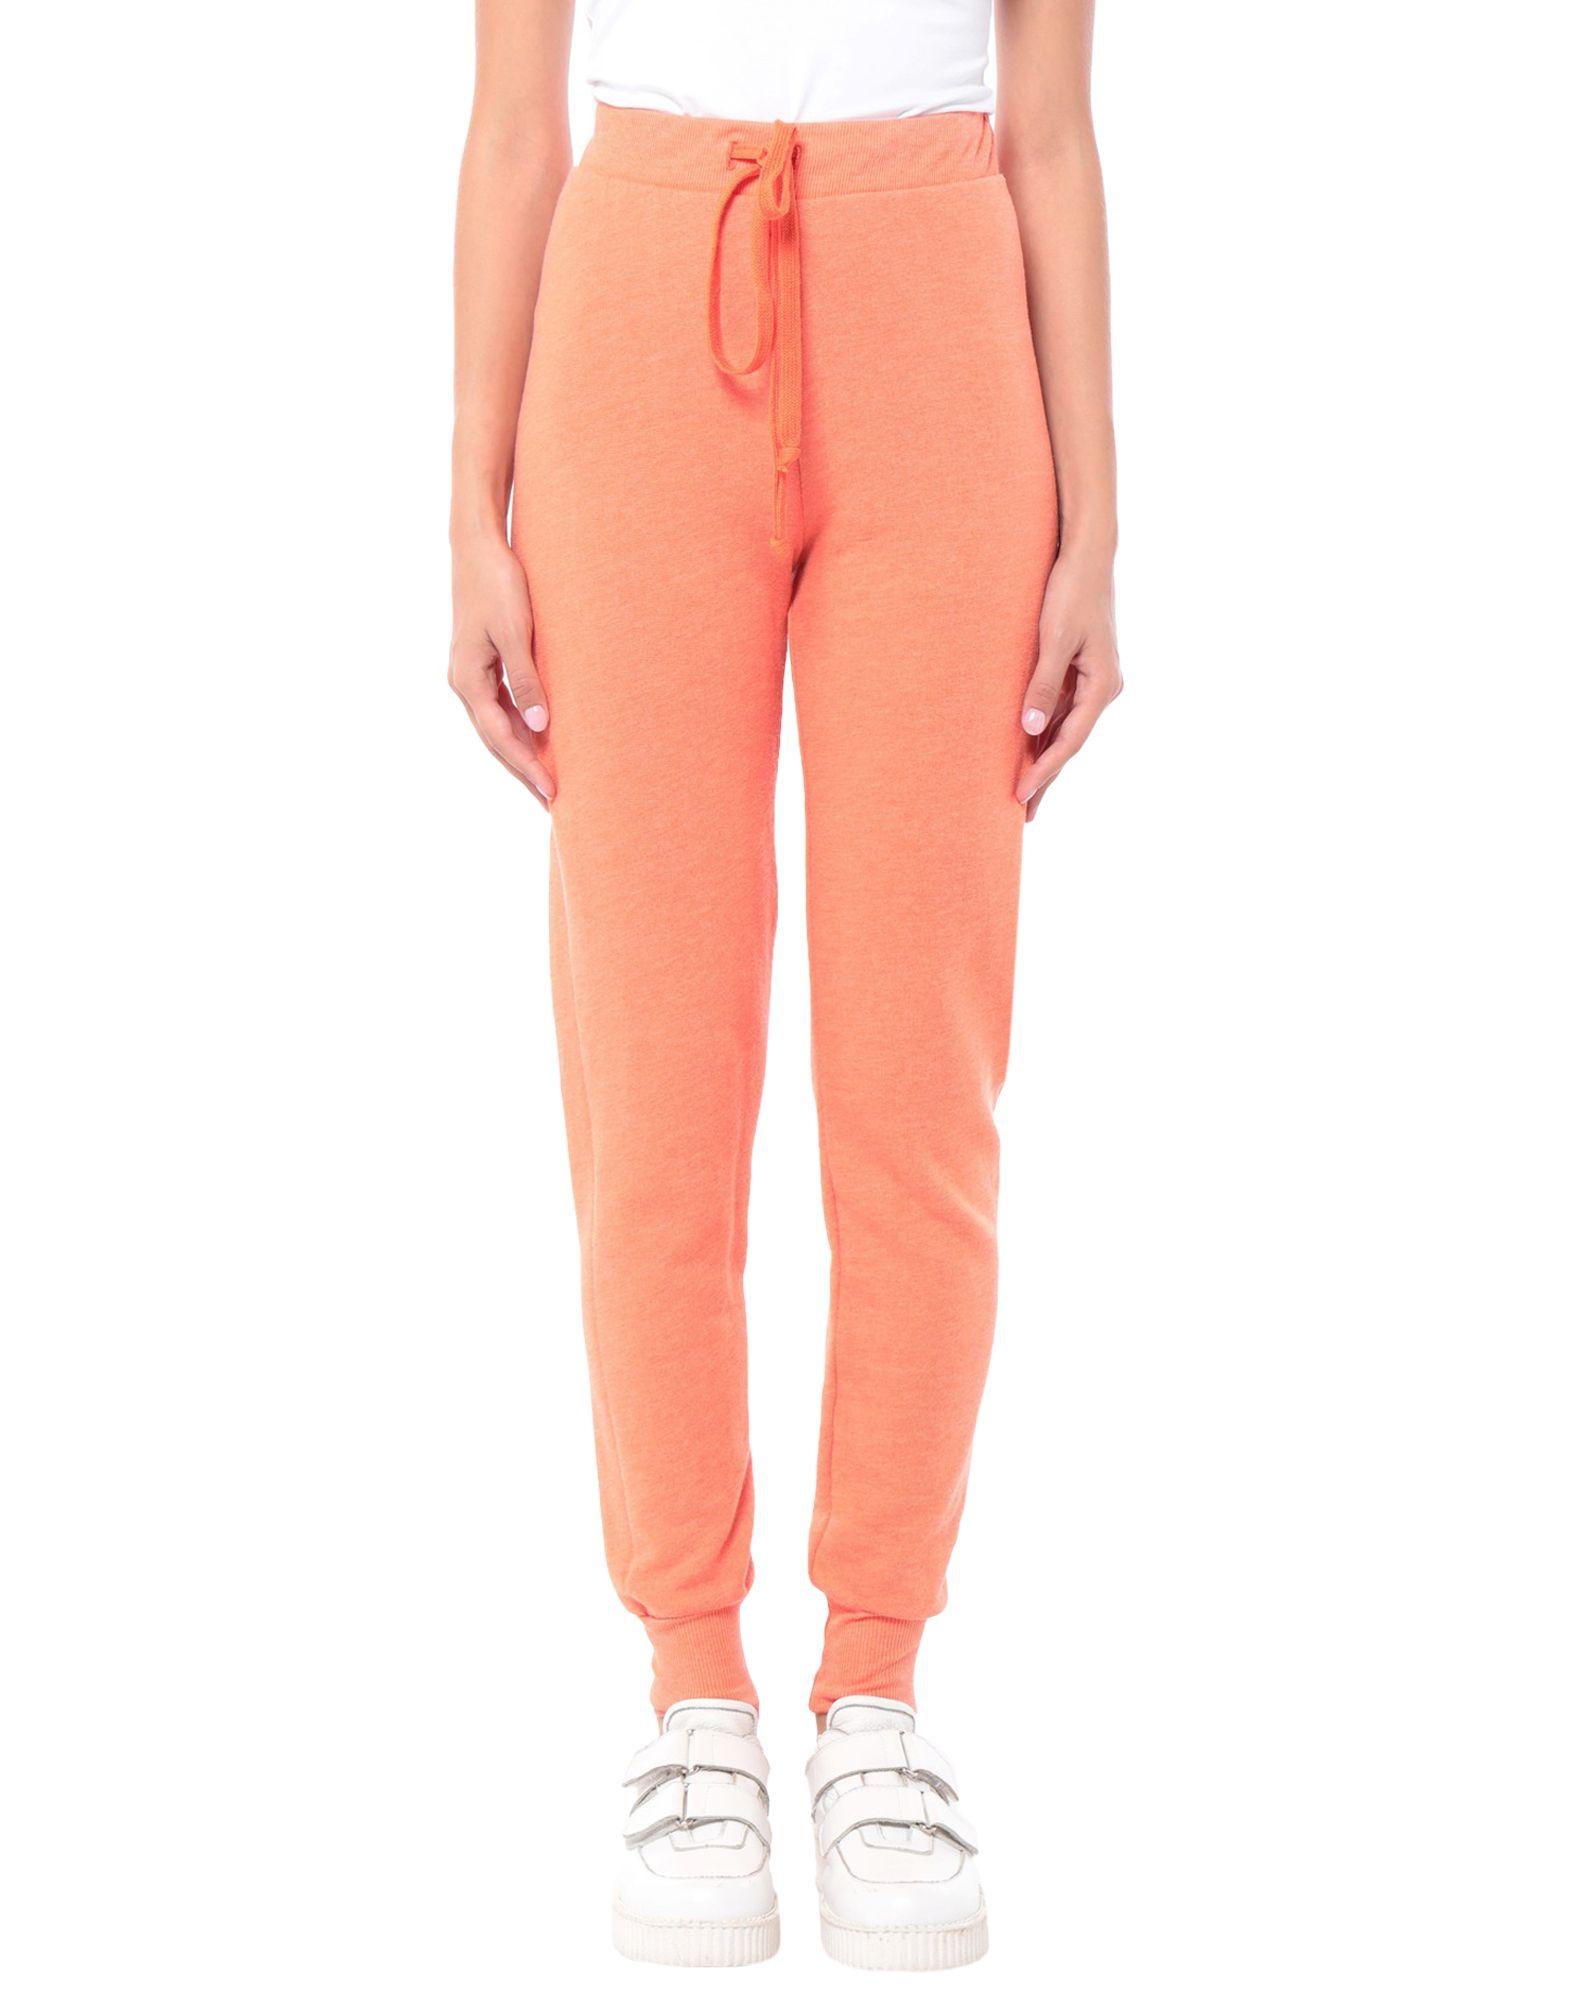 WILDFOX Casual pants. sweatshirt fleece, basic solid color, no appliqués, mid rise, regular fit, tapered leg, drawstring closure, no pockets. 50% Polyester, 50% Cotton